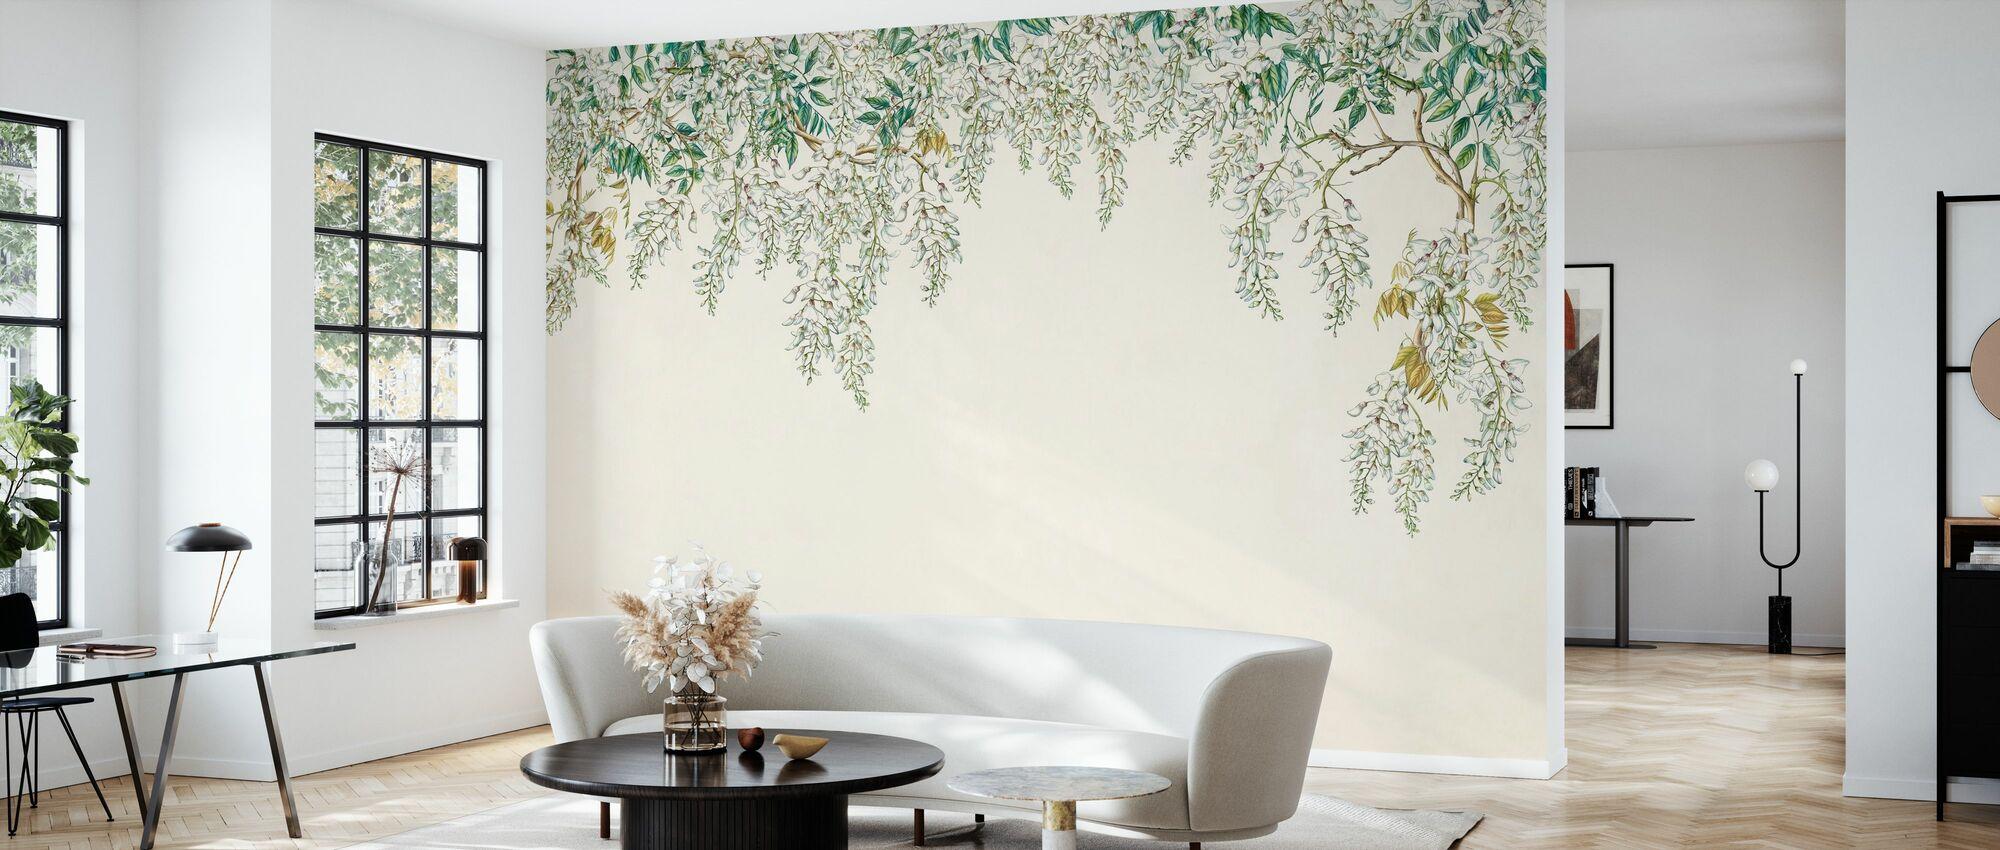 White Wisteria - Wallpaper - Living Room